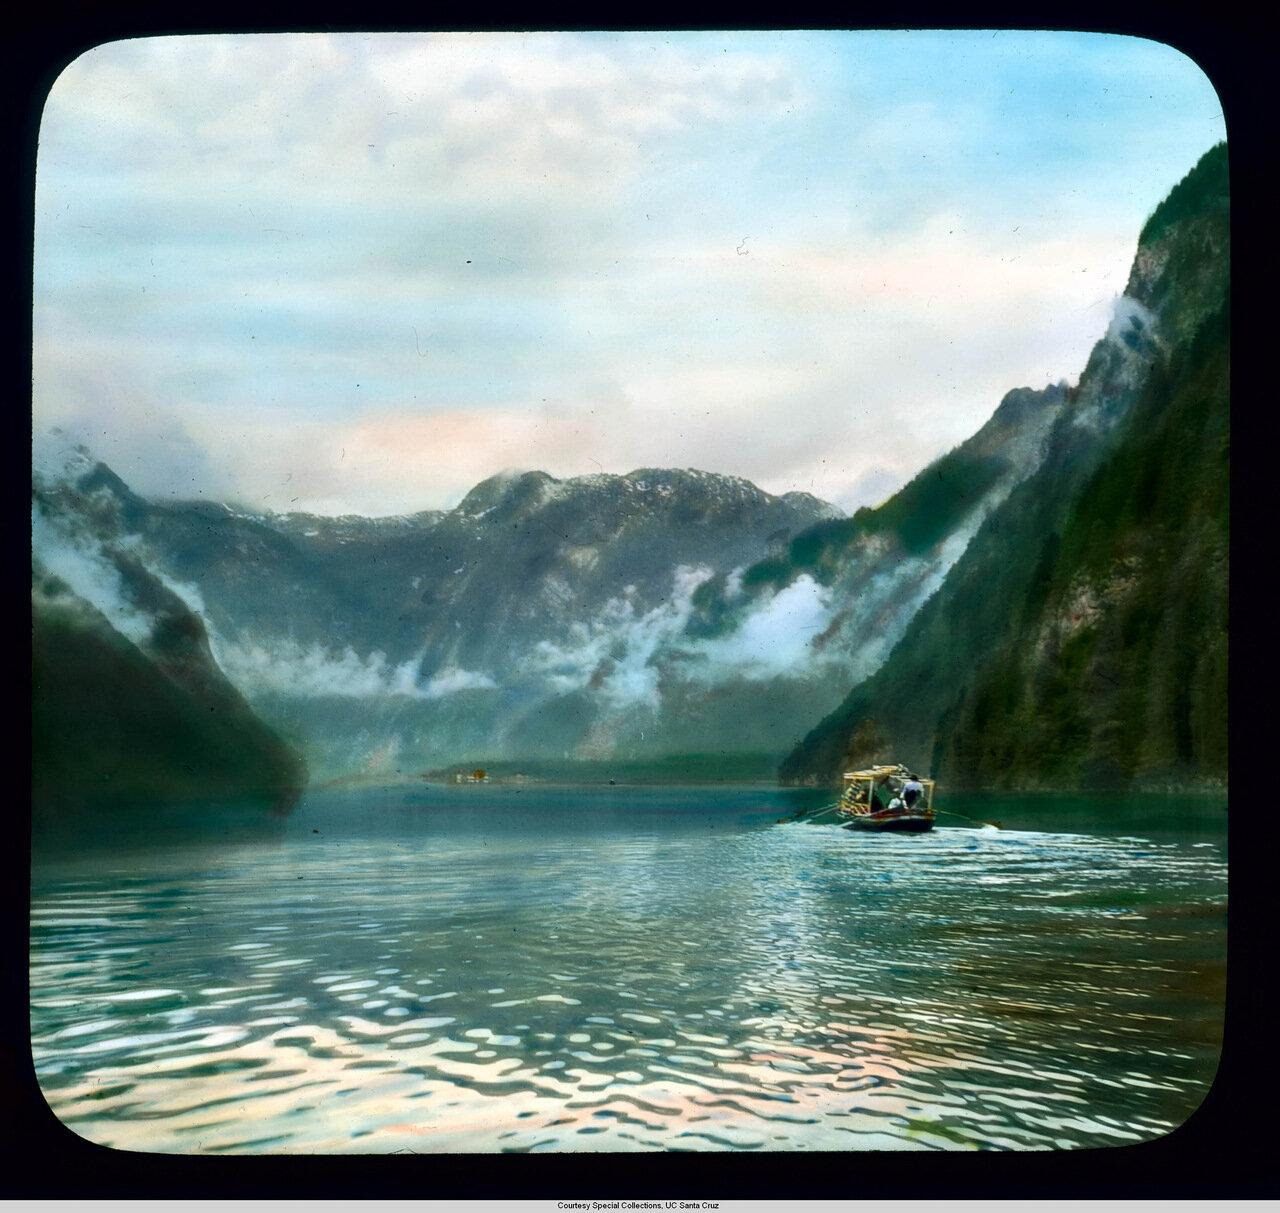 Бавария. Лодка на Кёнигсзе в Баварских Альпах